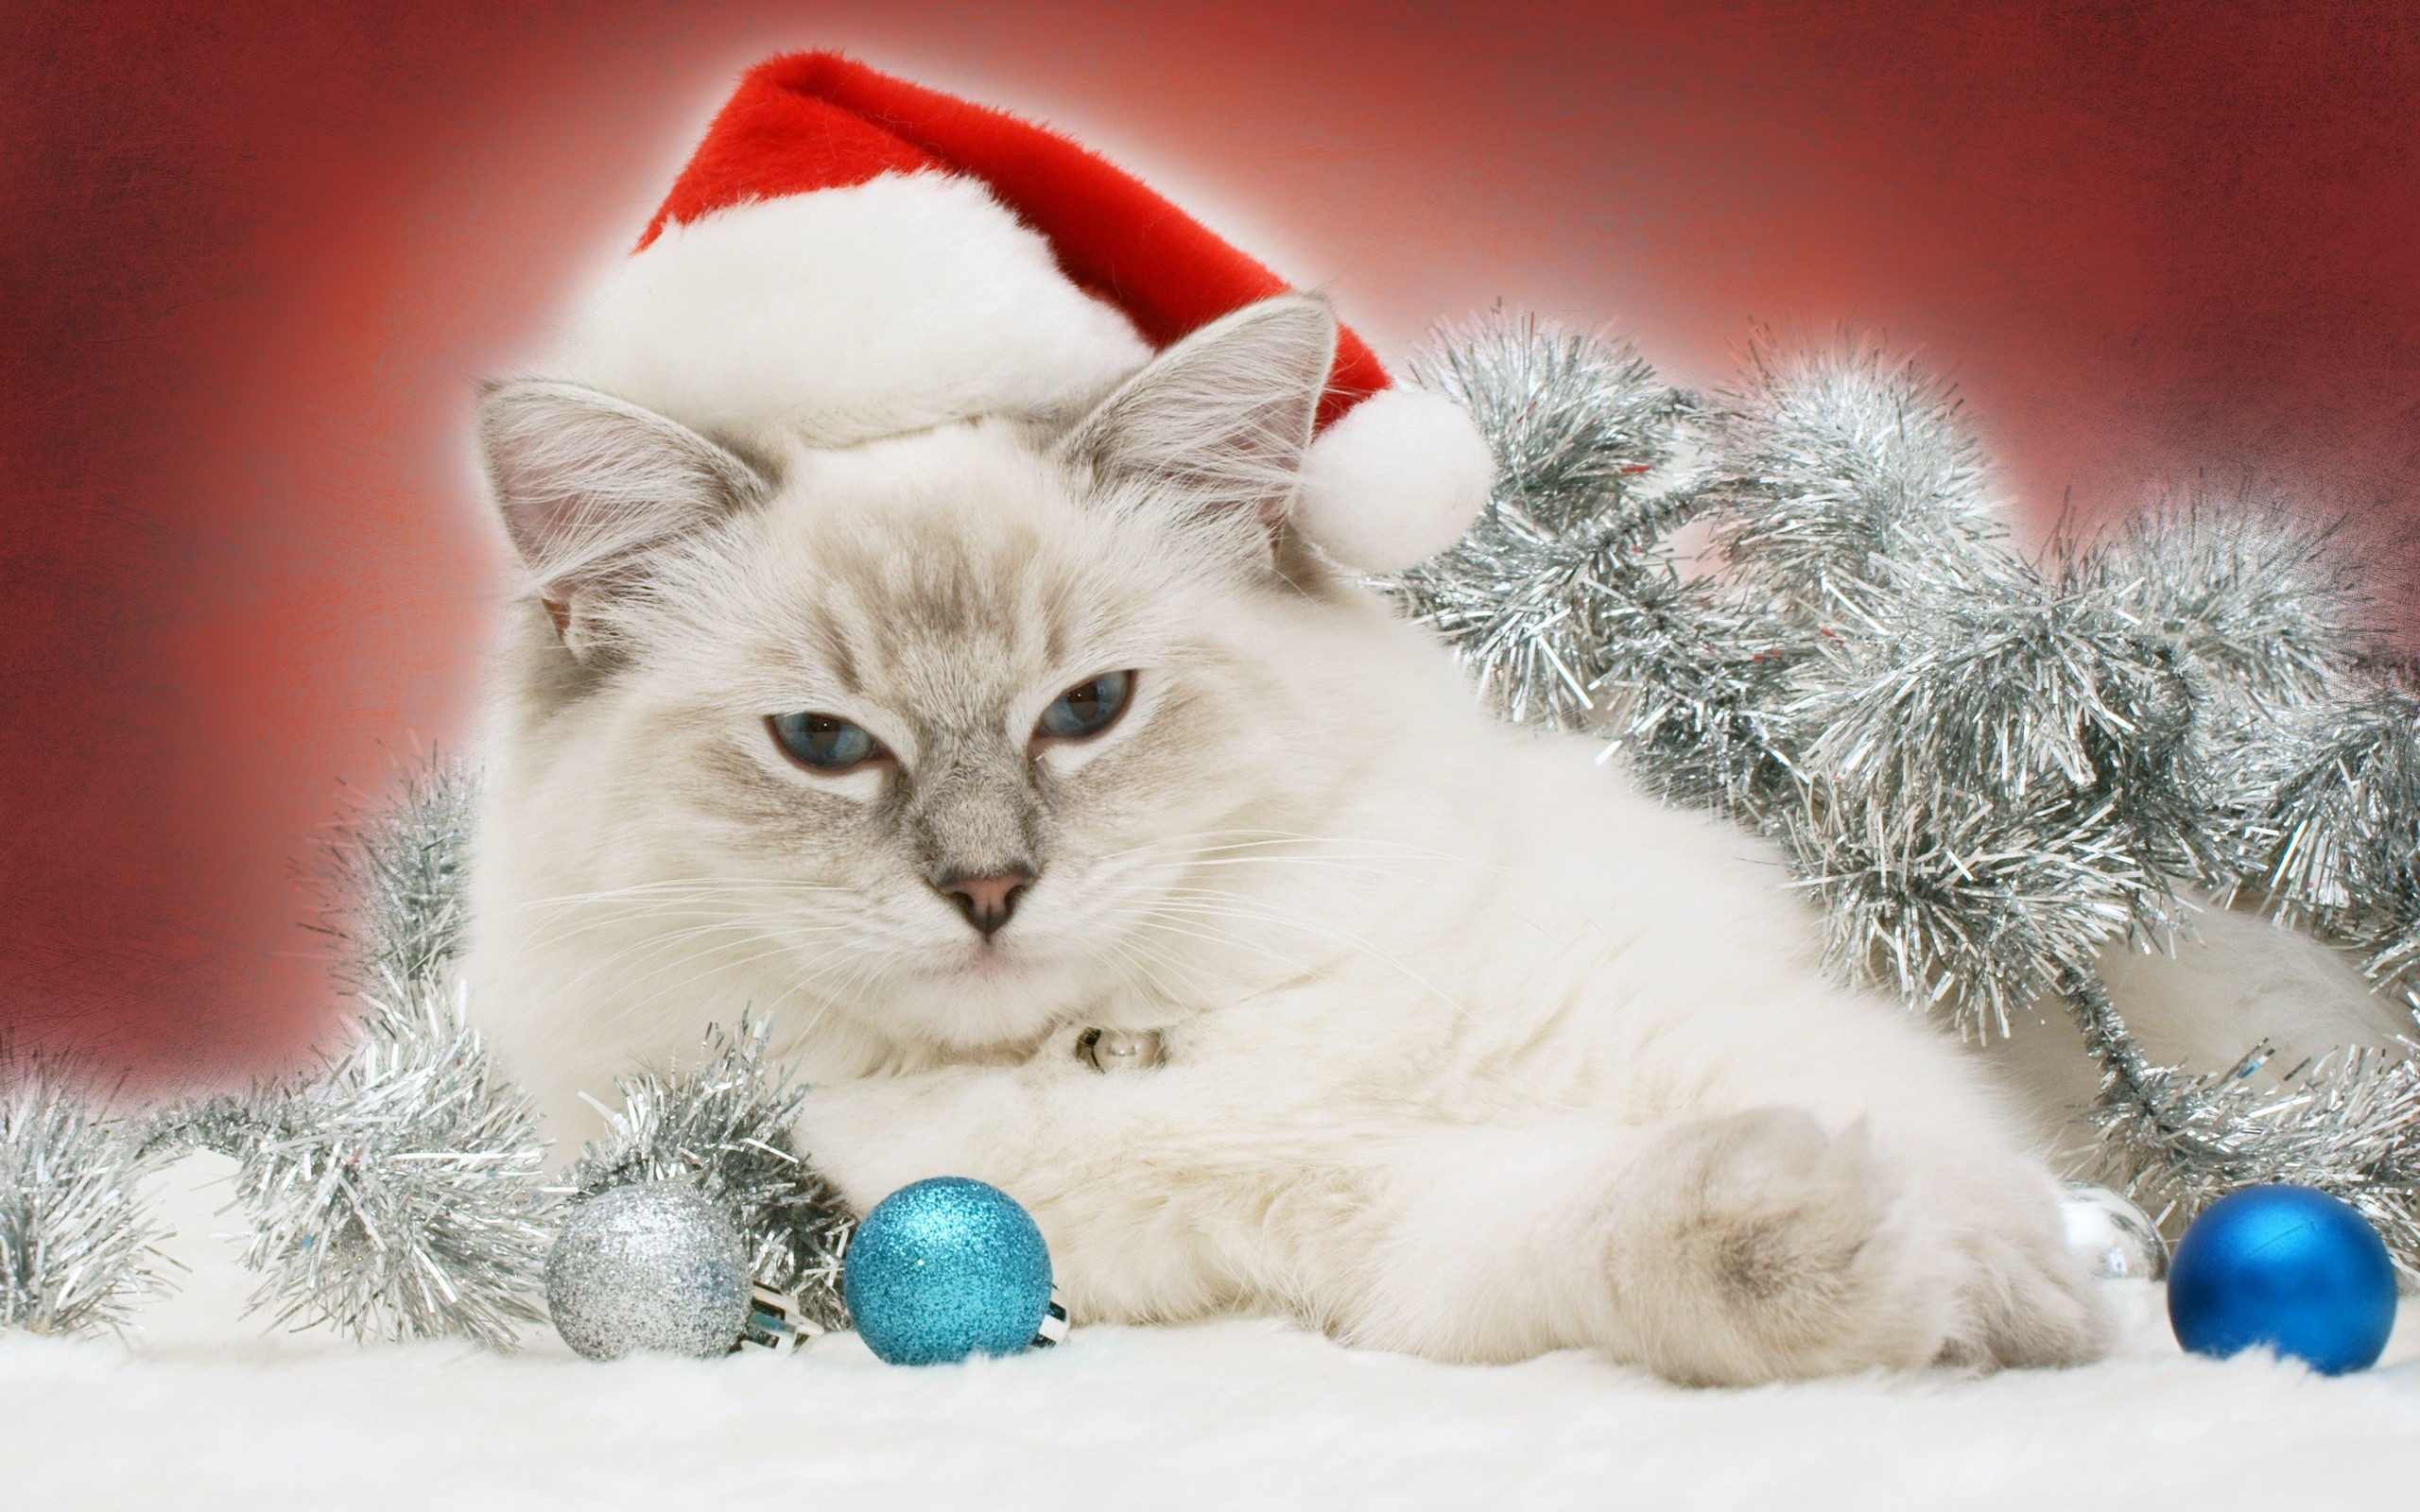 Christmas Cat Wallpaper (75+ images)